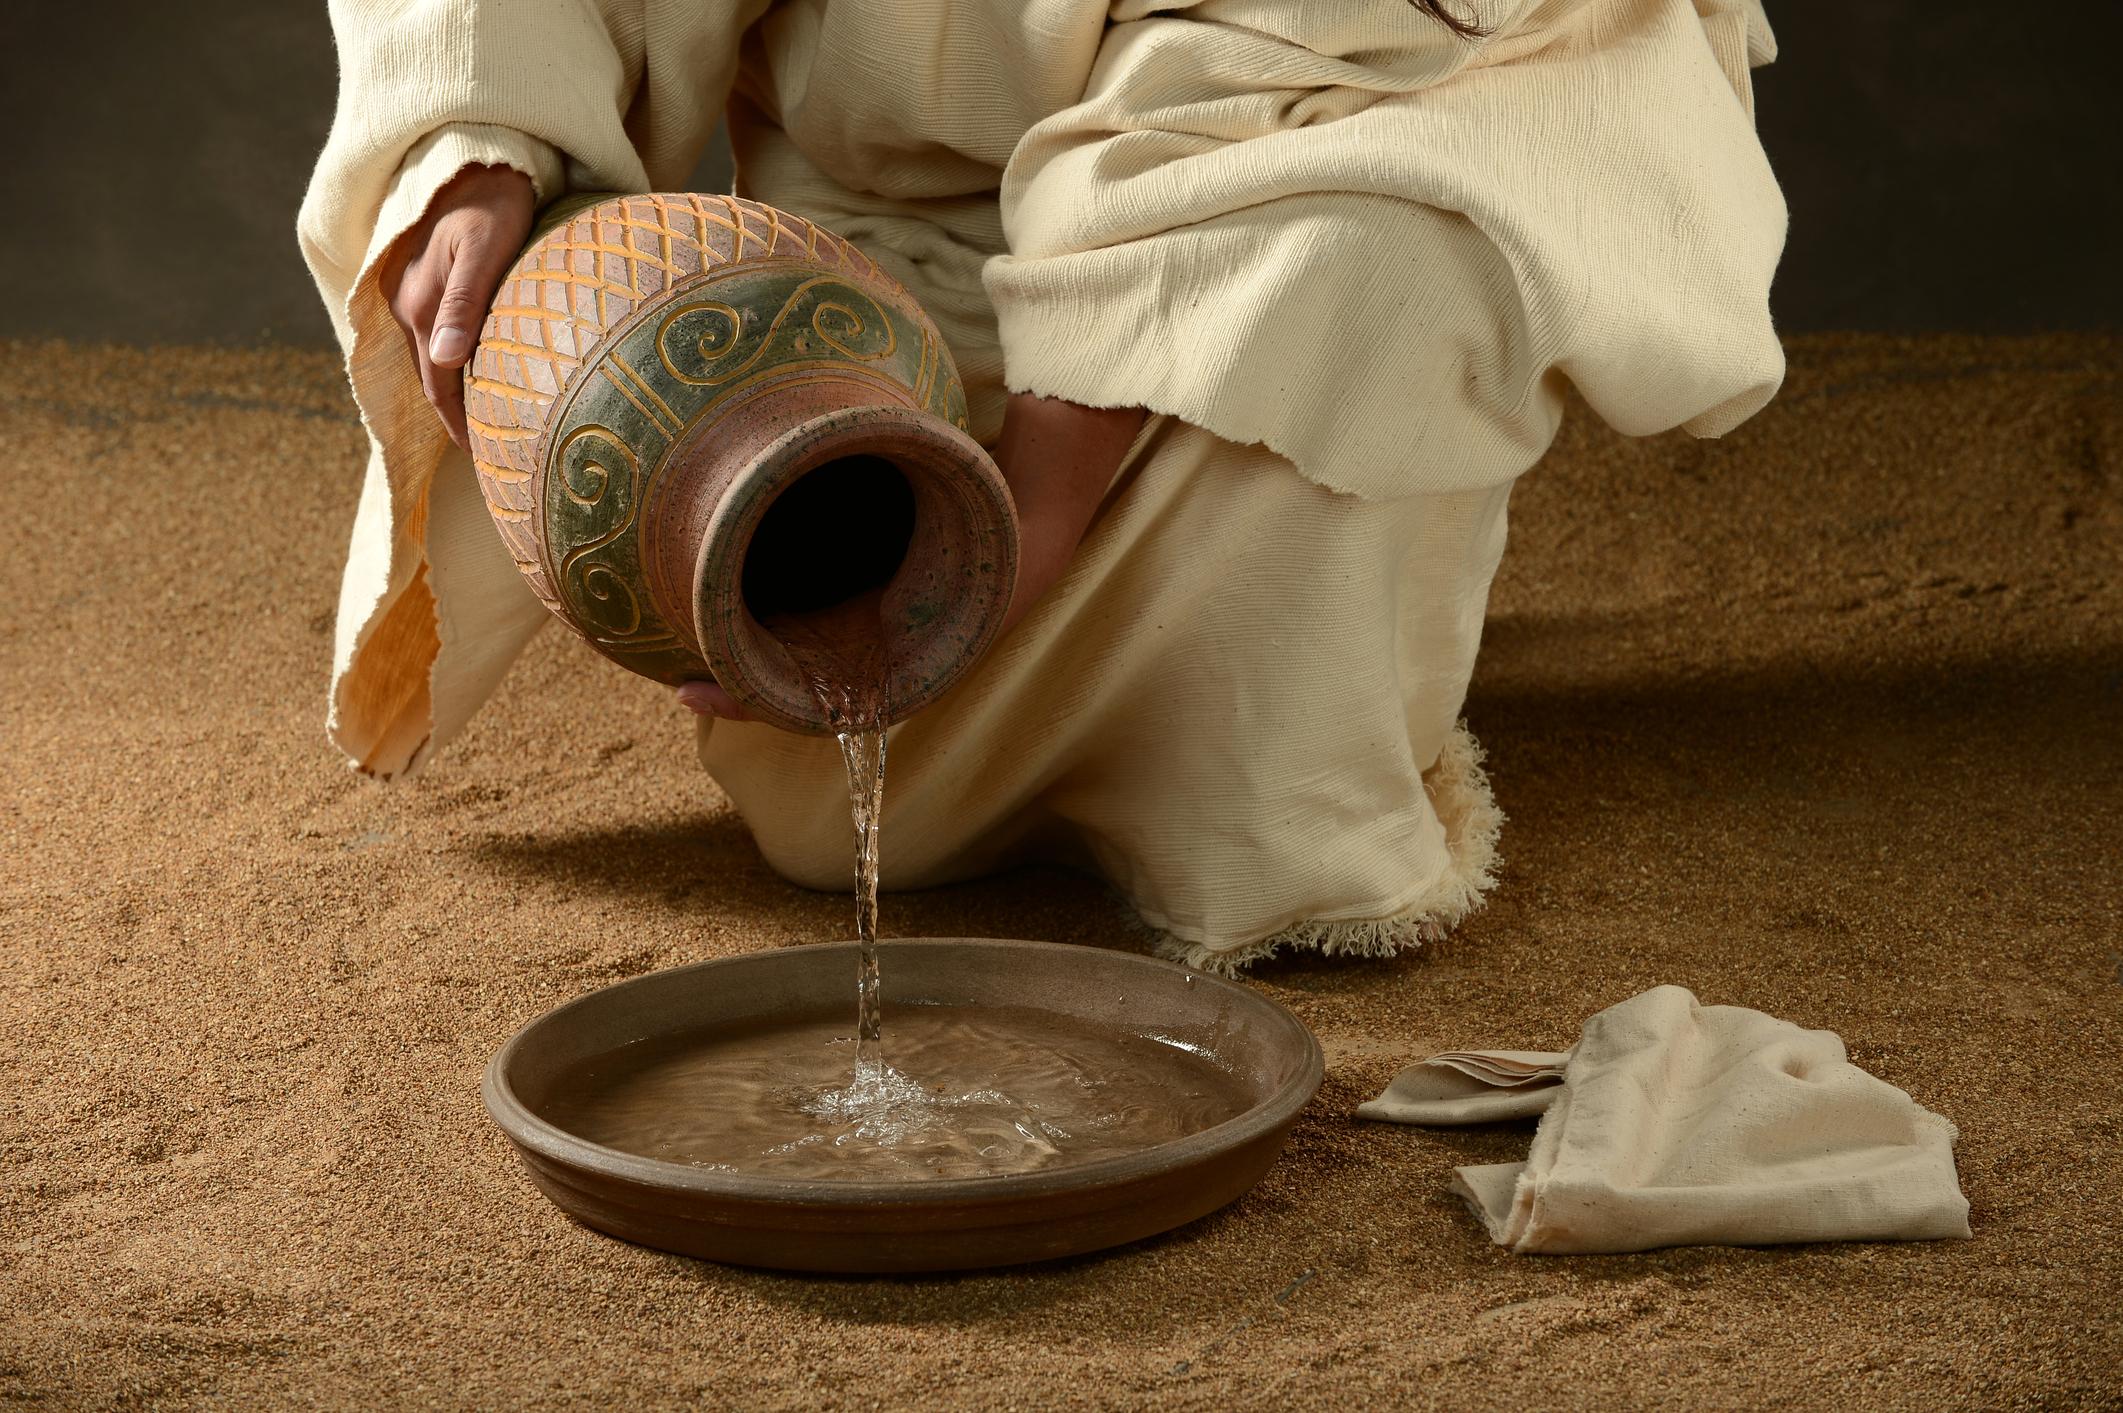 jesus pouring water model for motherhood.jpg